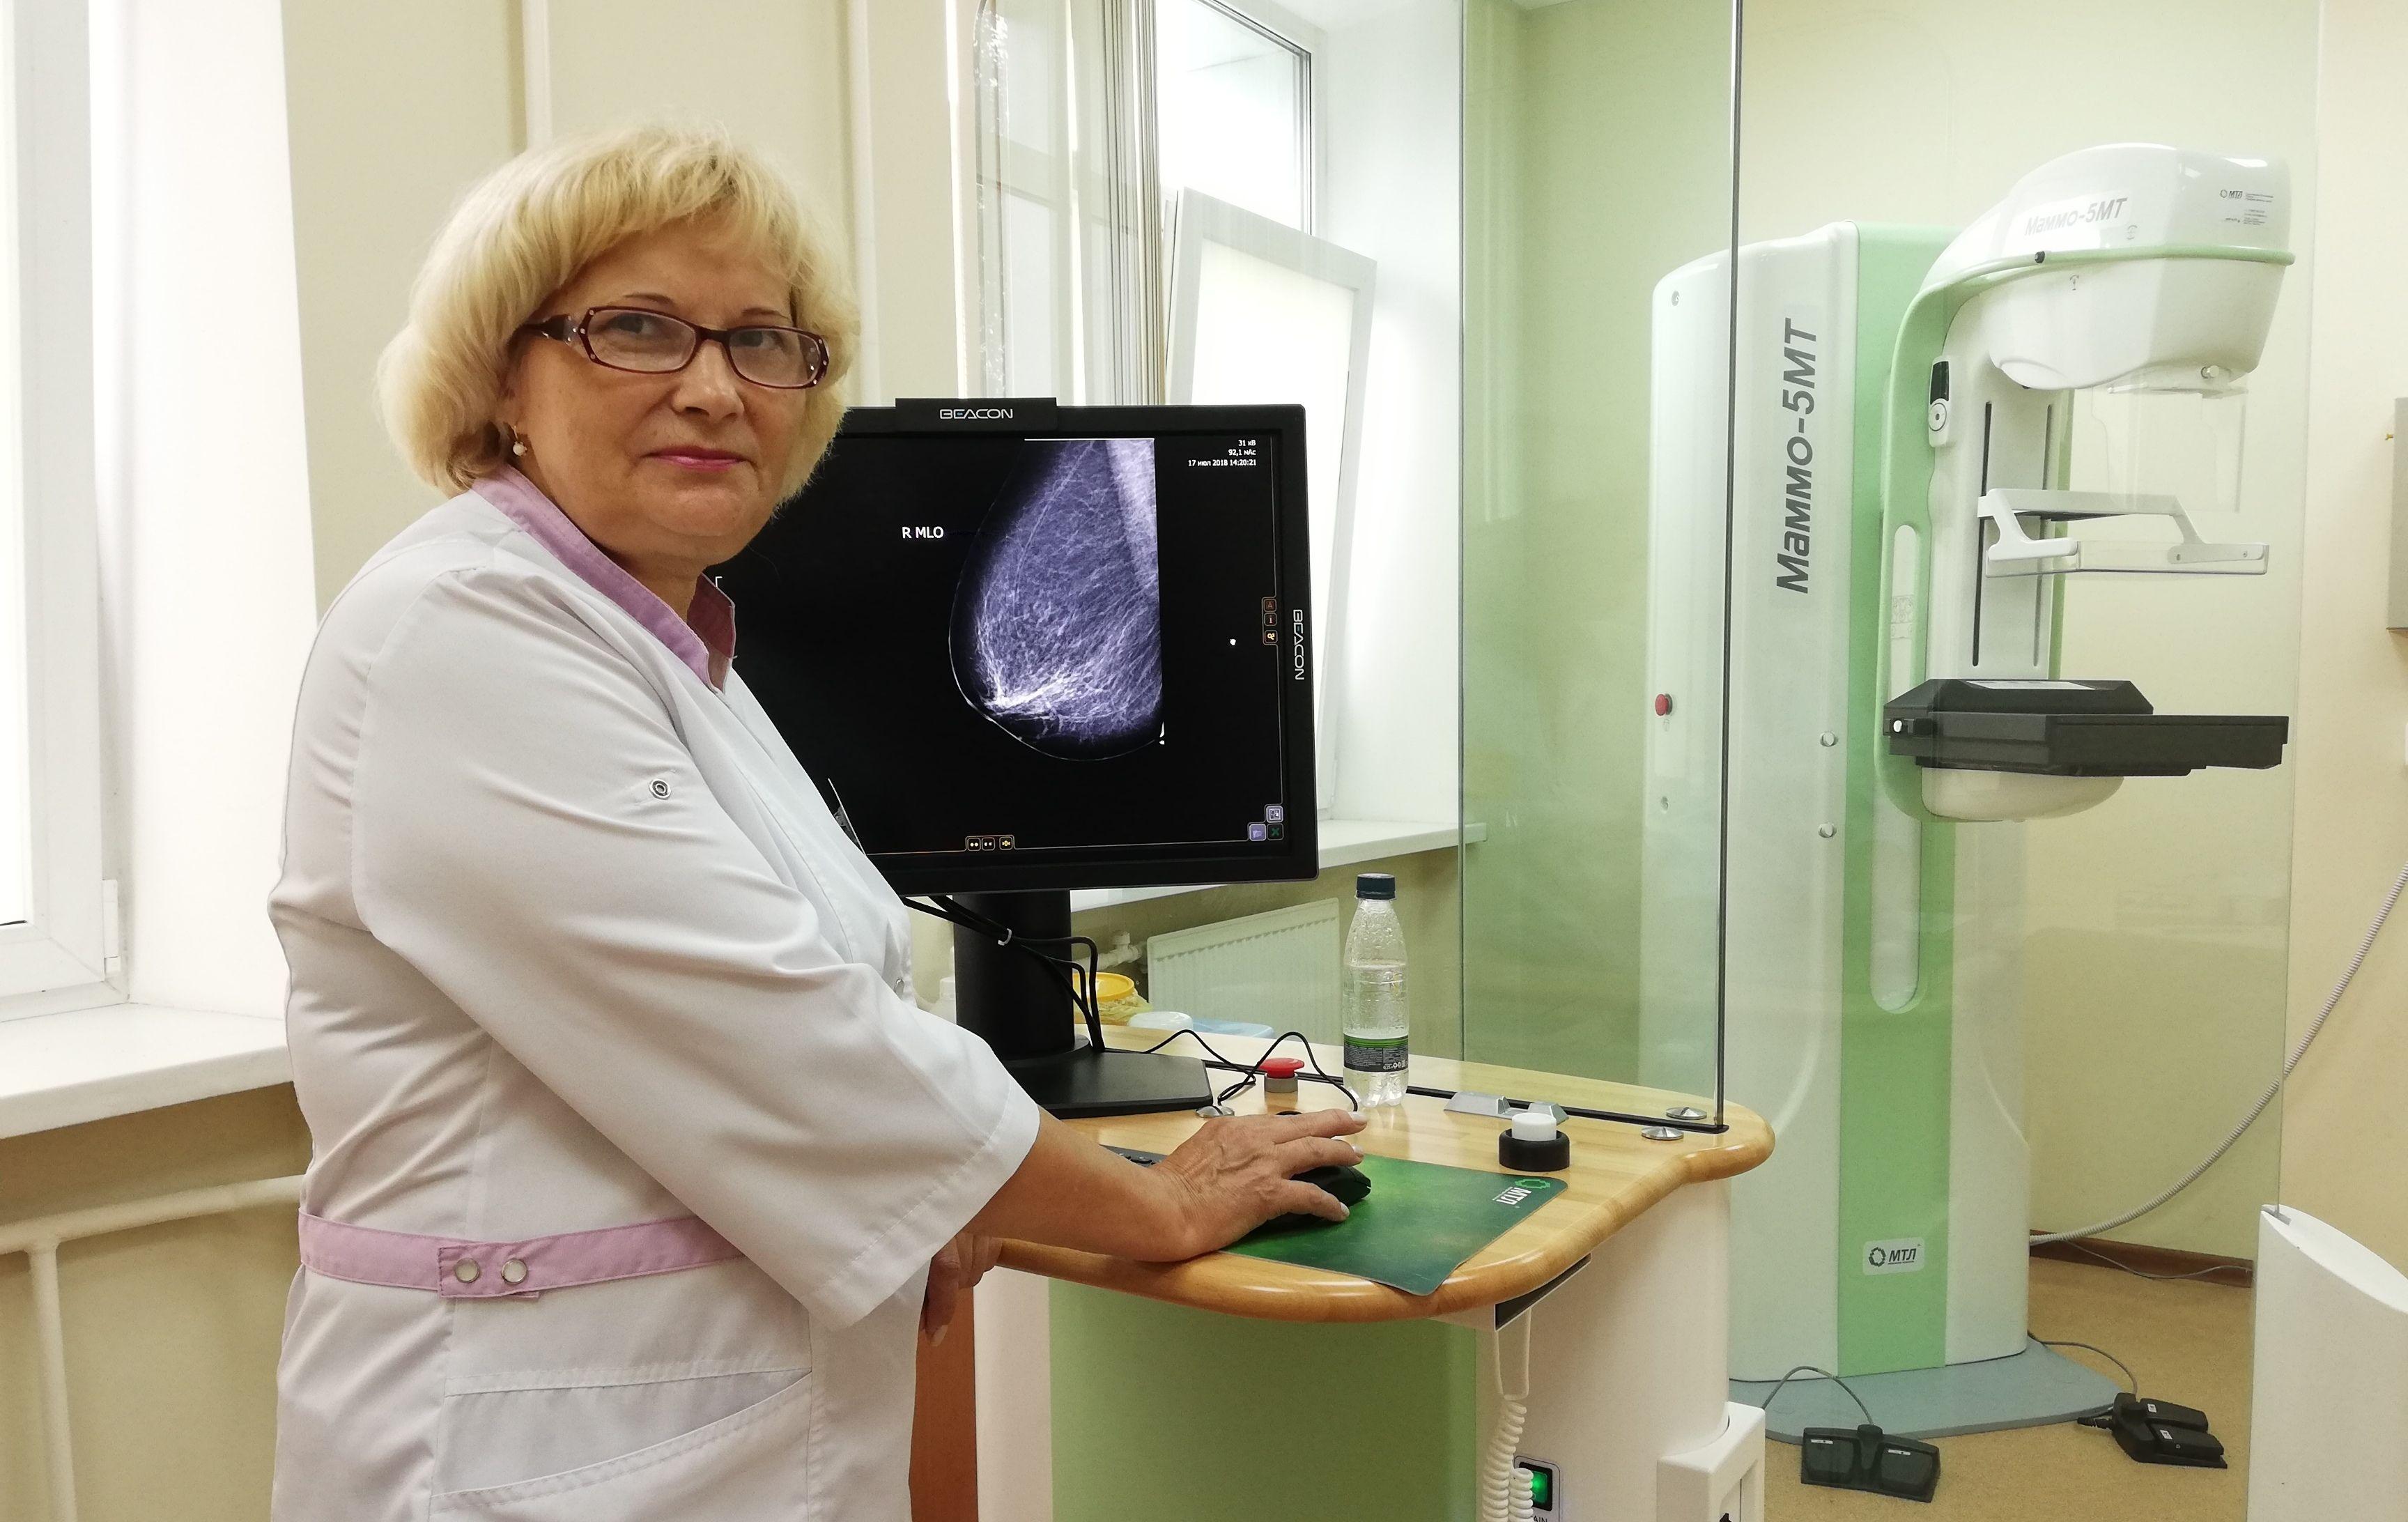 врач-диагност смотрит рентген-снимок молочной железы